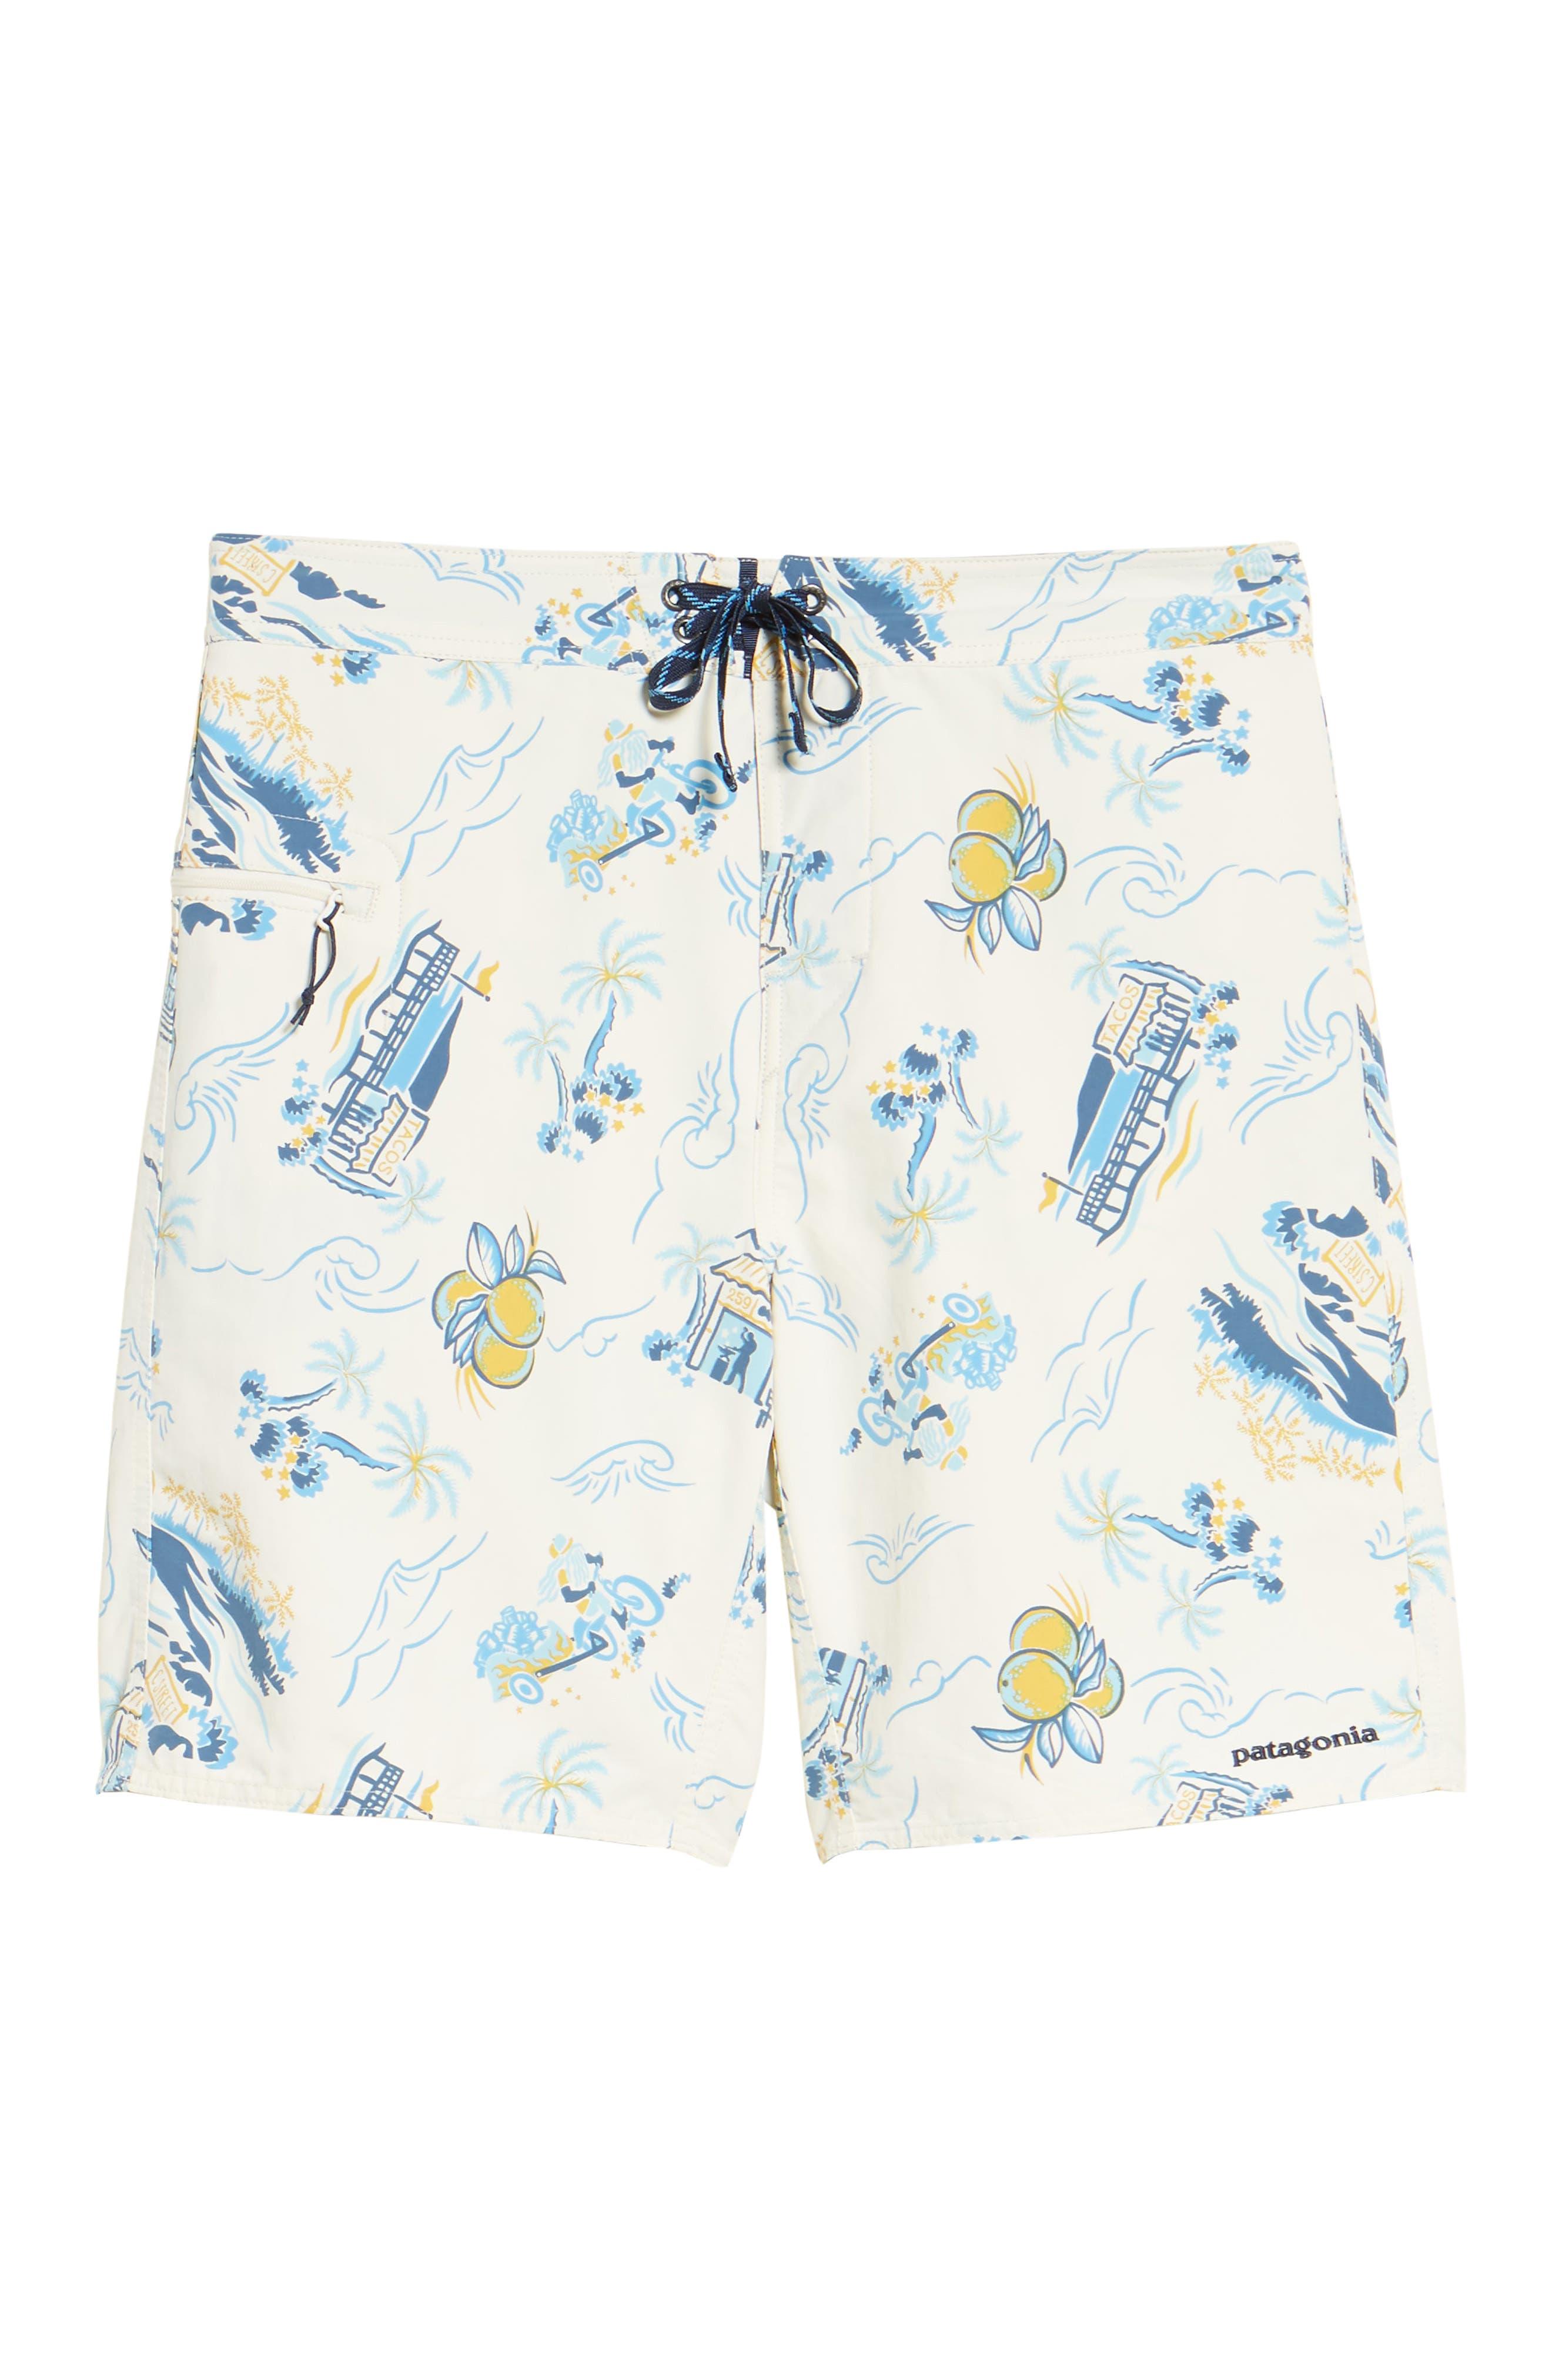 Wavefarer Board Shorts,                             Alternate thumbnail 6, color,                             100